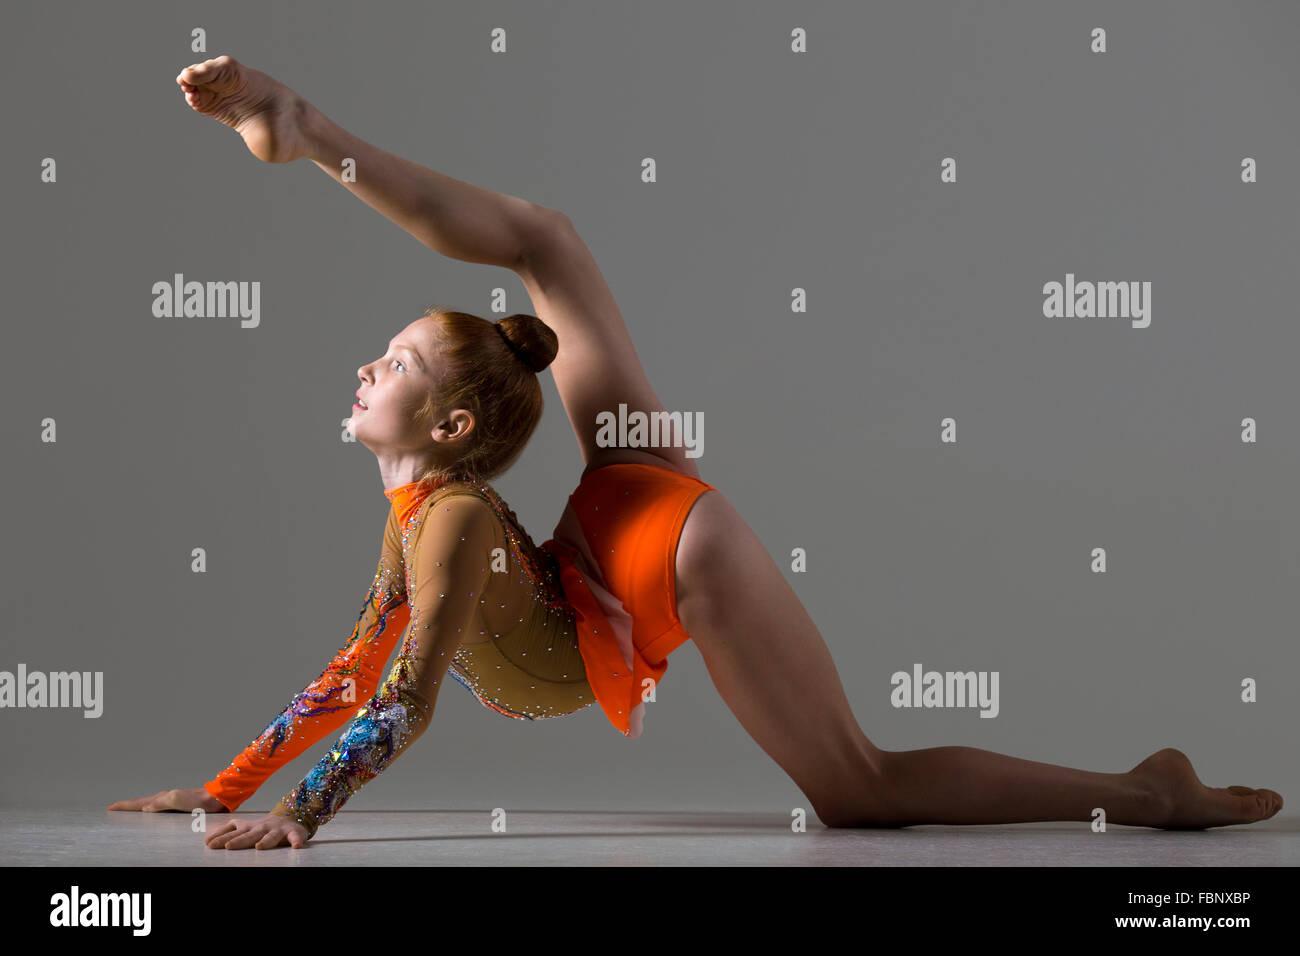 Athlète gymnaste attrayant teenage girl wearing colorful danseur danseur de l'exercice, danse, pose, faisant Photo Stock